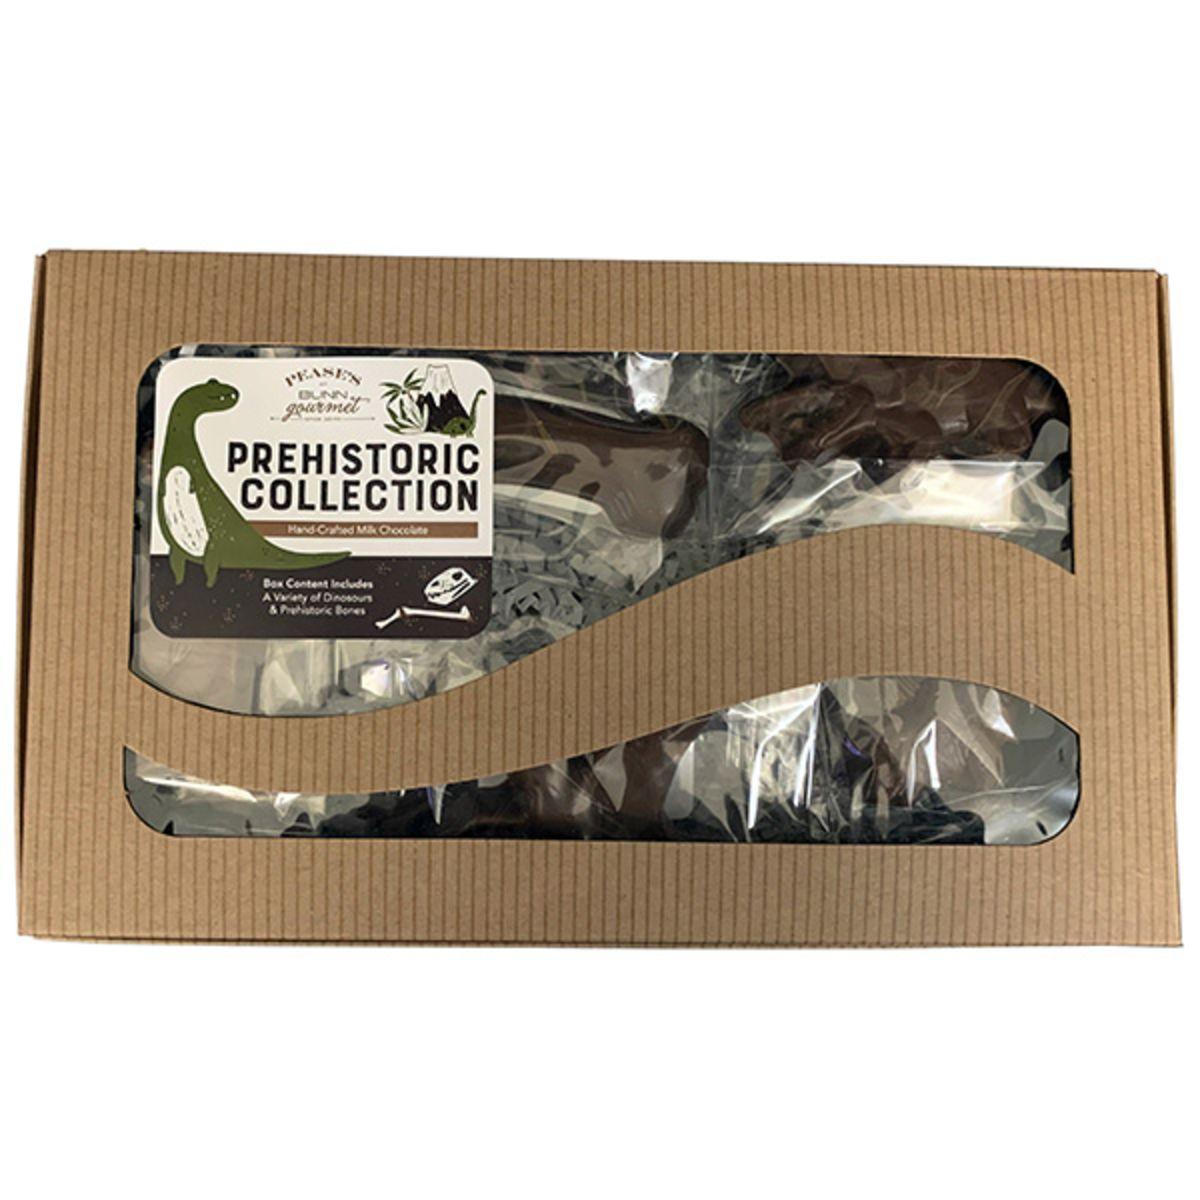 Prehistoric Collection